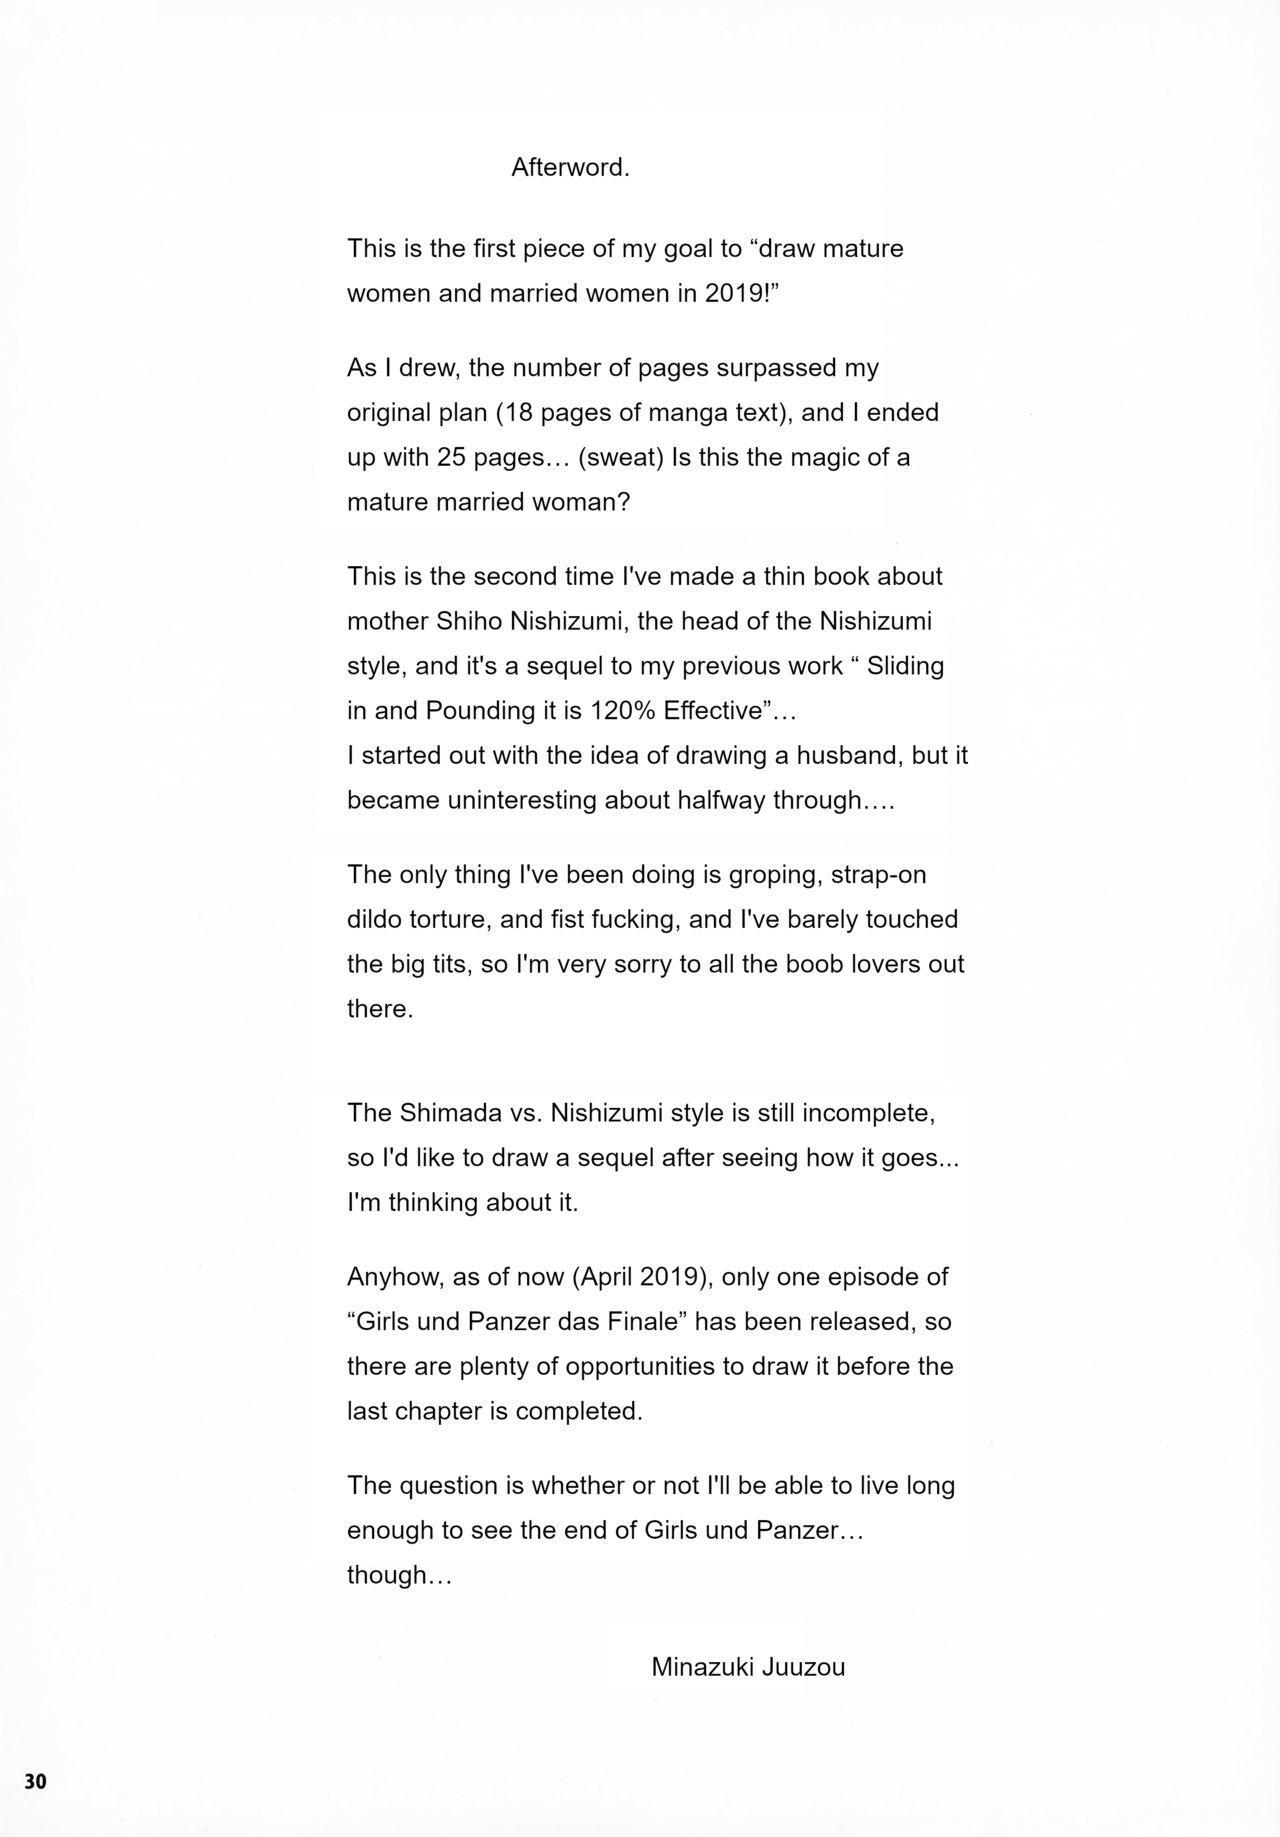 (COMIC1☆15) [Gerupin (Minazuki Juuzou, USSO)] Shimada-ryuu VS Nishizumi-ryuu Bijukujo Lesbian Kyokugen Kougyaku Gurui | Shimada Style VS Nishizumi Style MILF Lesbian Extreme Anal Fetish (Girls und Panzer) [English] 28